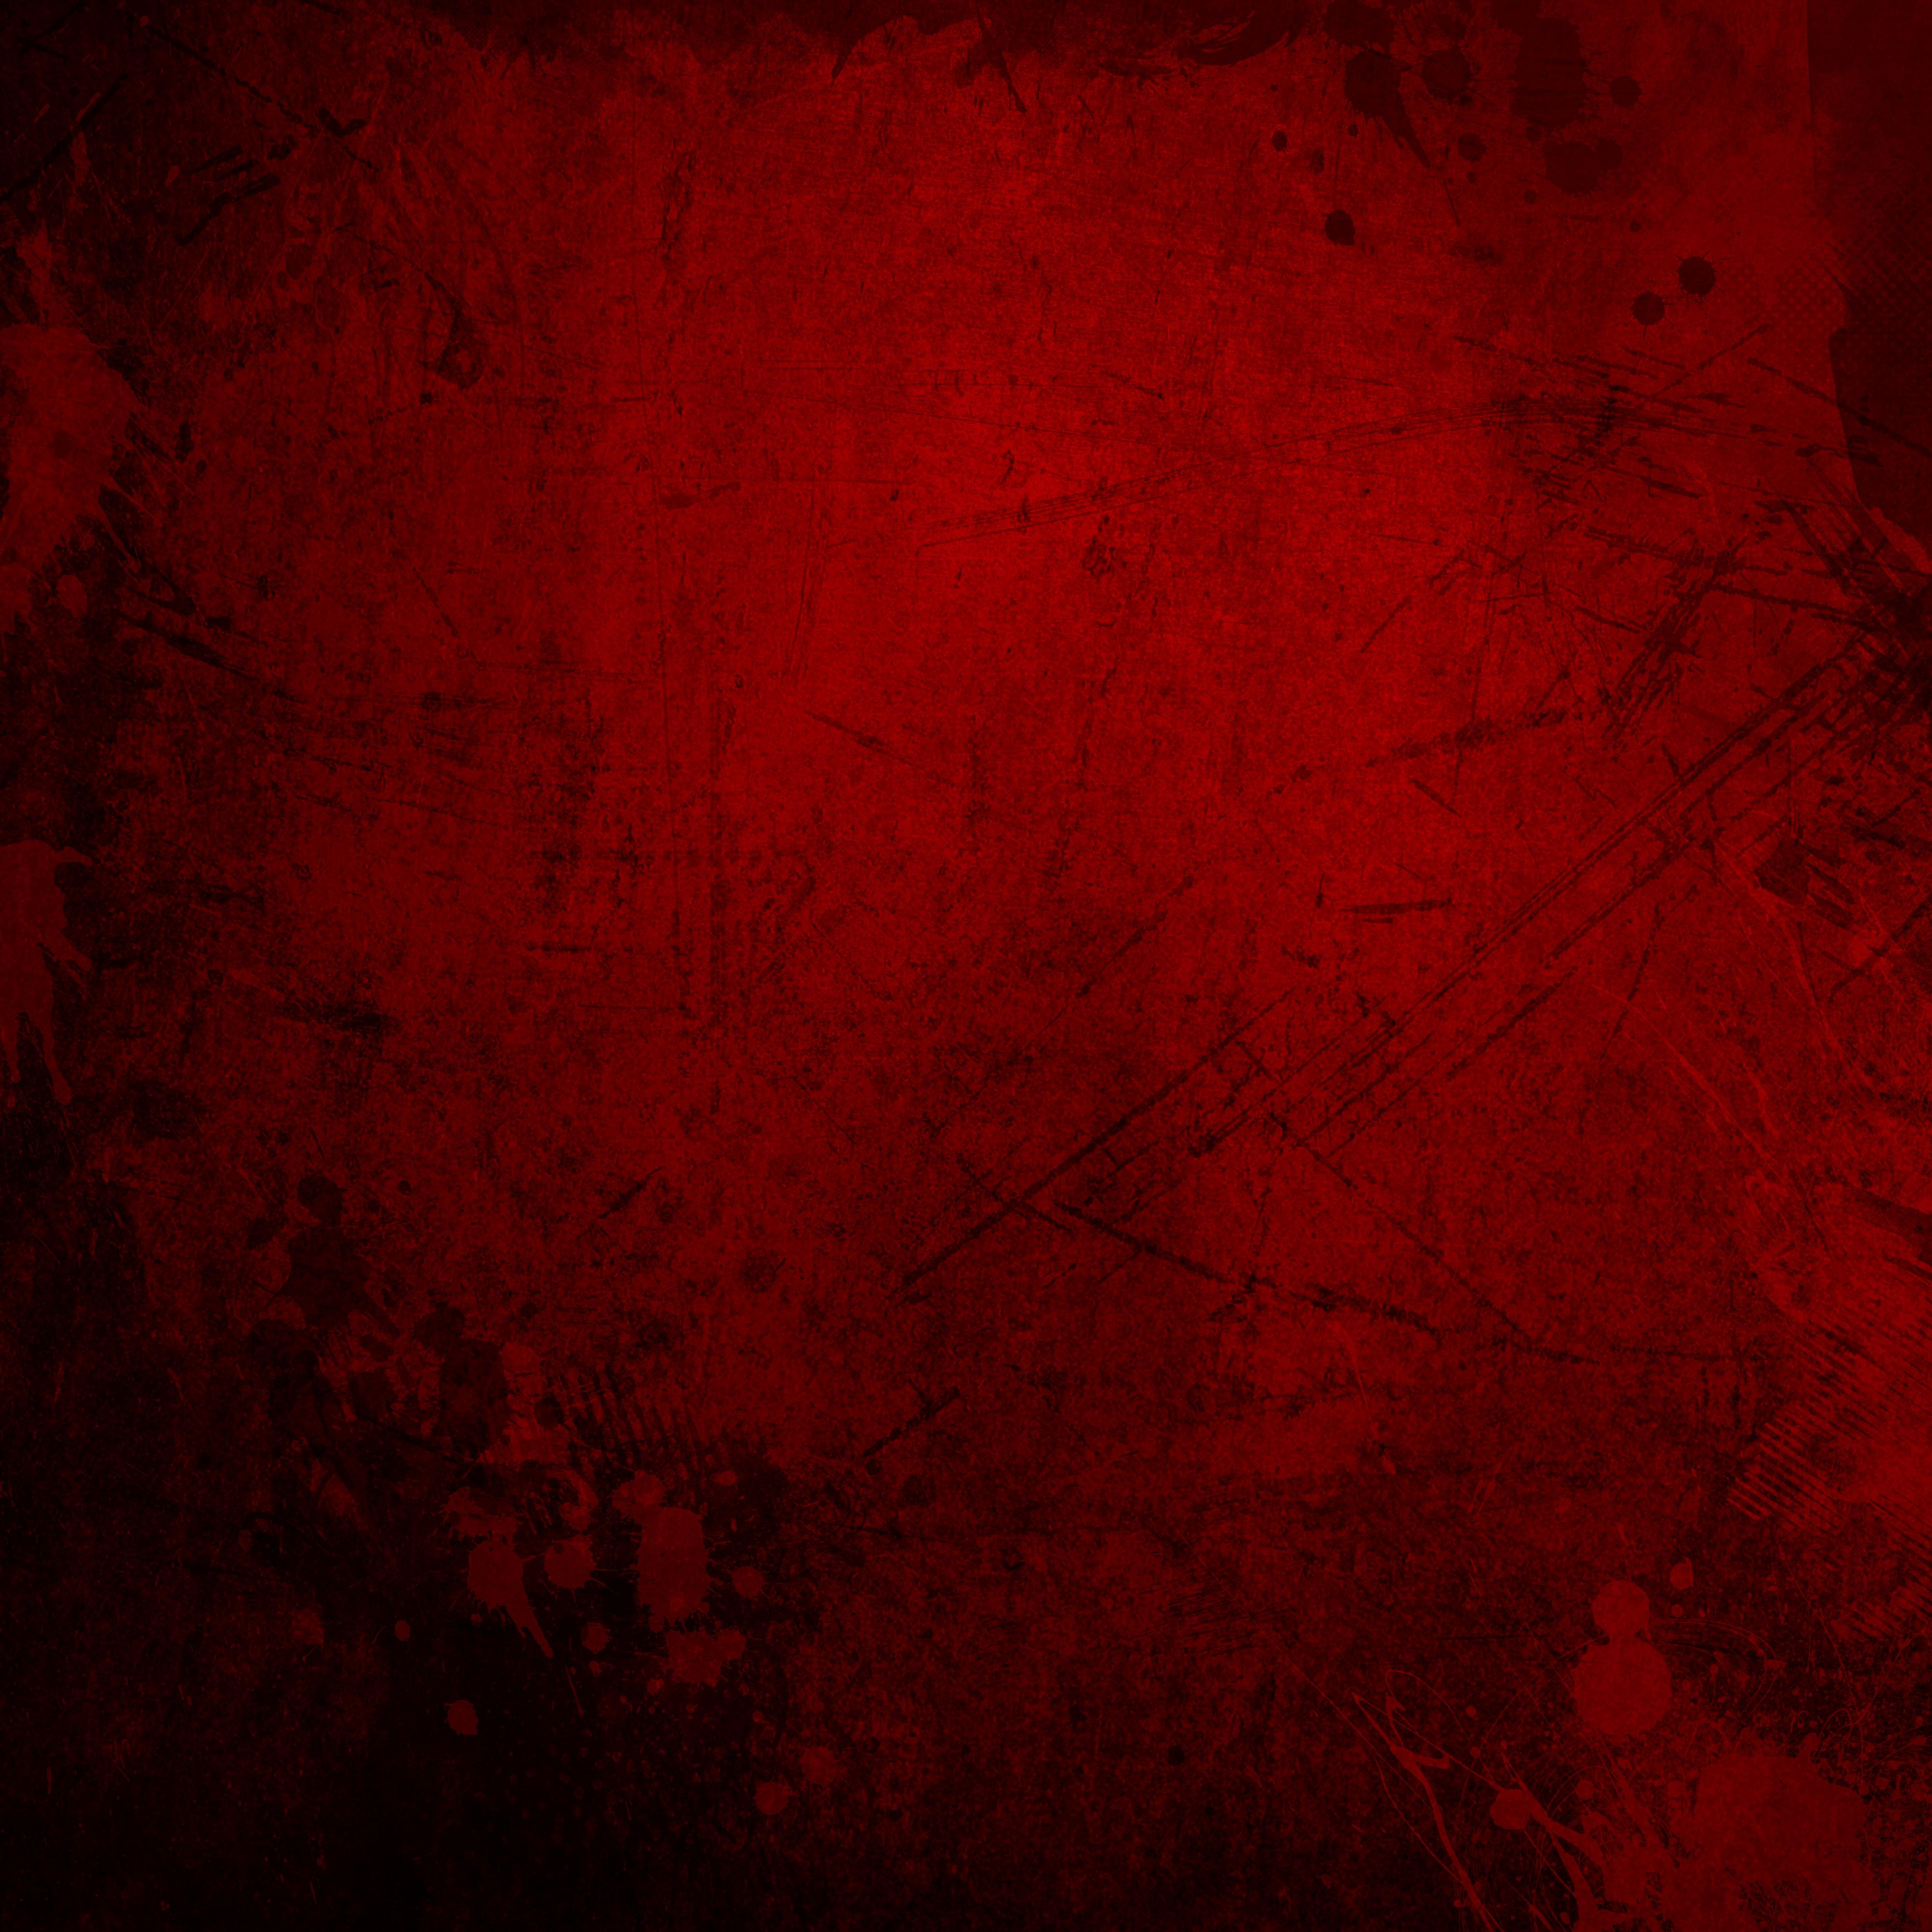 Red Grunge Background Tumblr 4000x4000